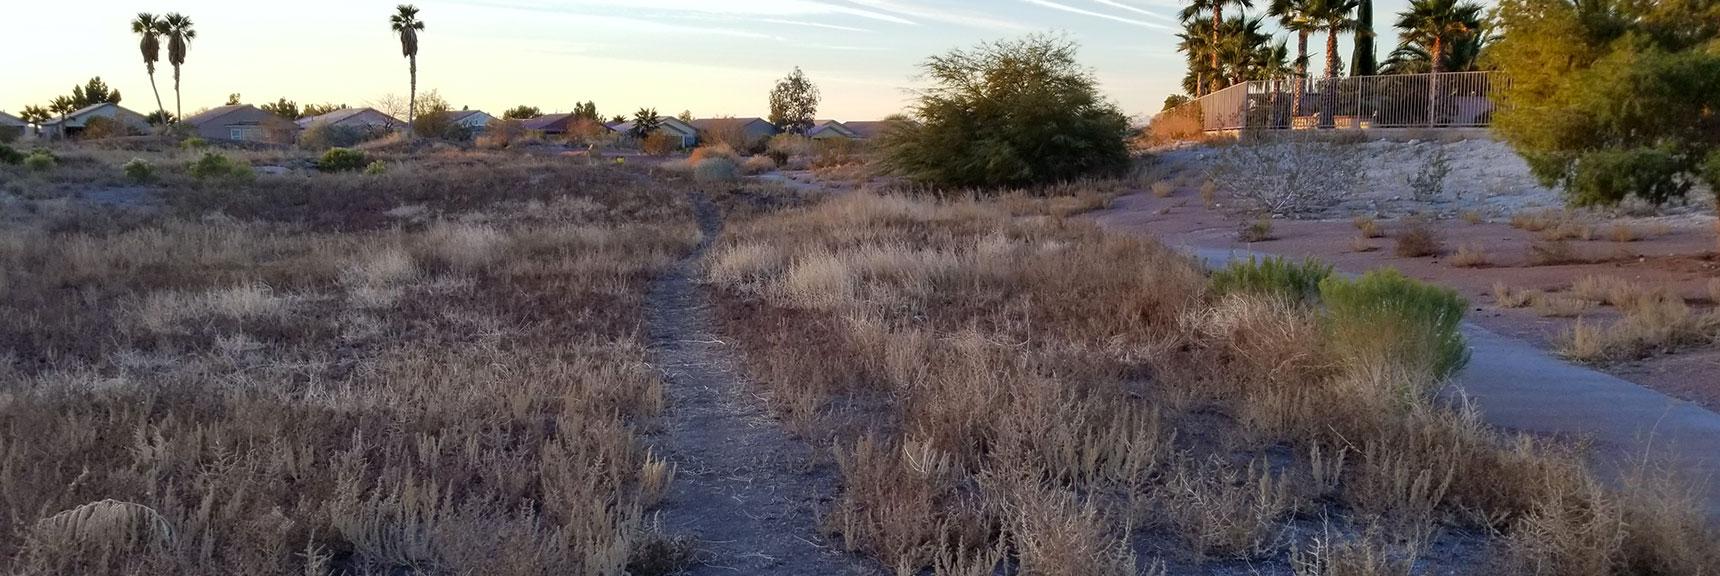 Environmental Consciousness in Las Vegas, Nevada, Slide 003